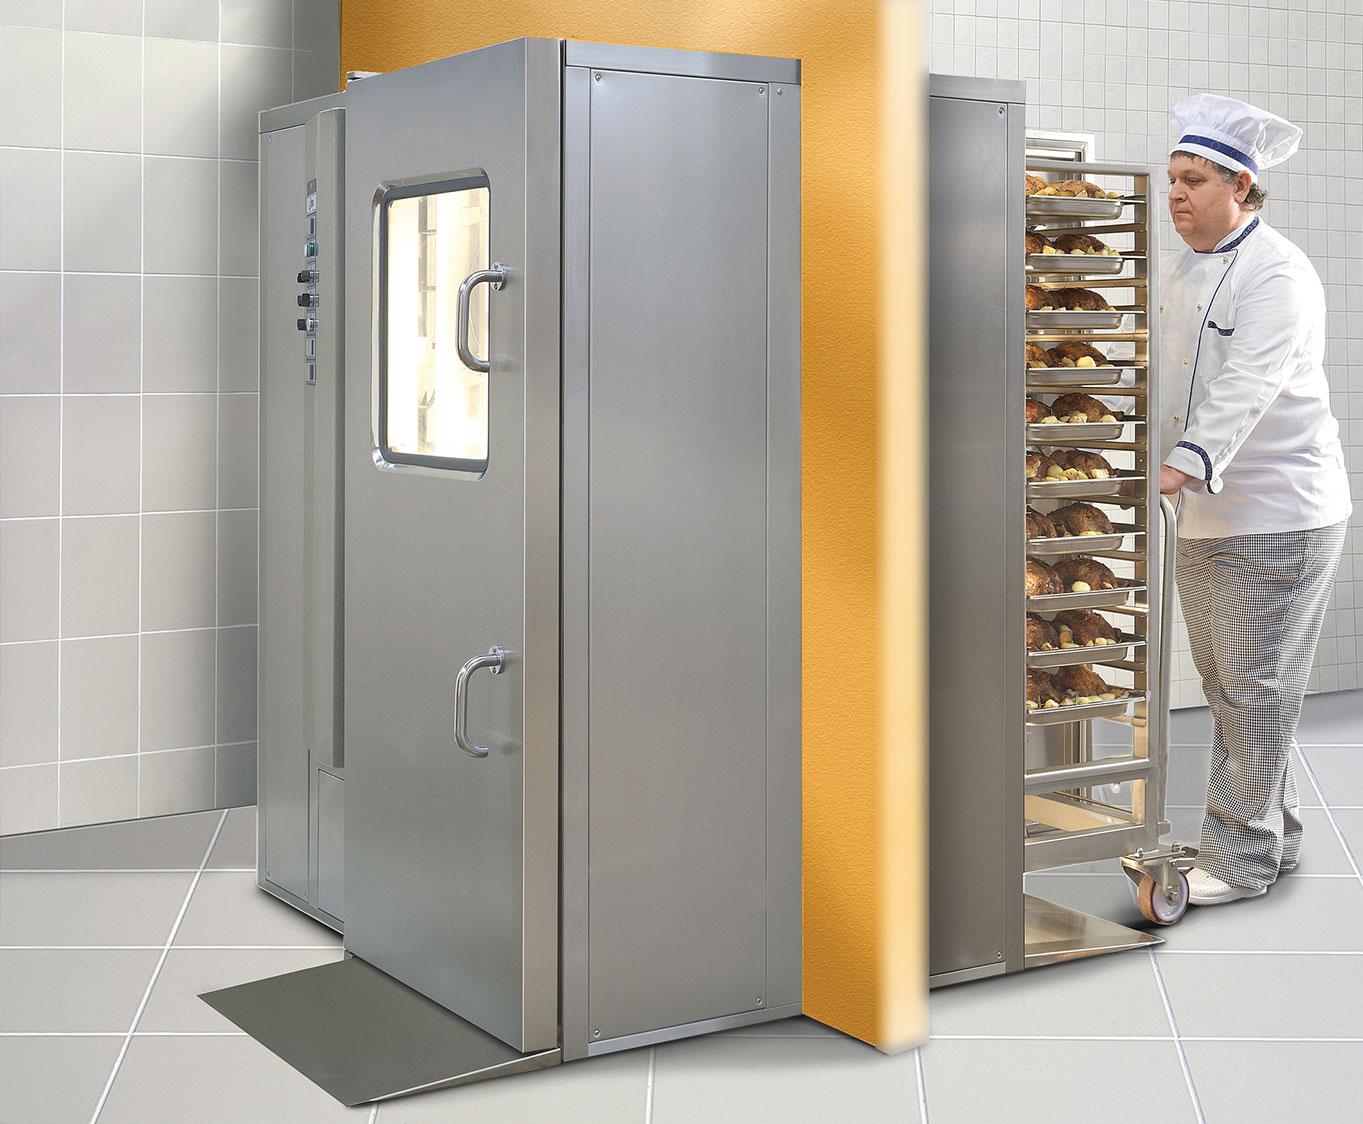 KSP 40 pass-through combi oven Nilma